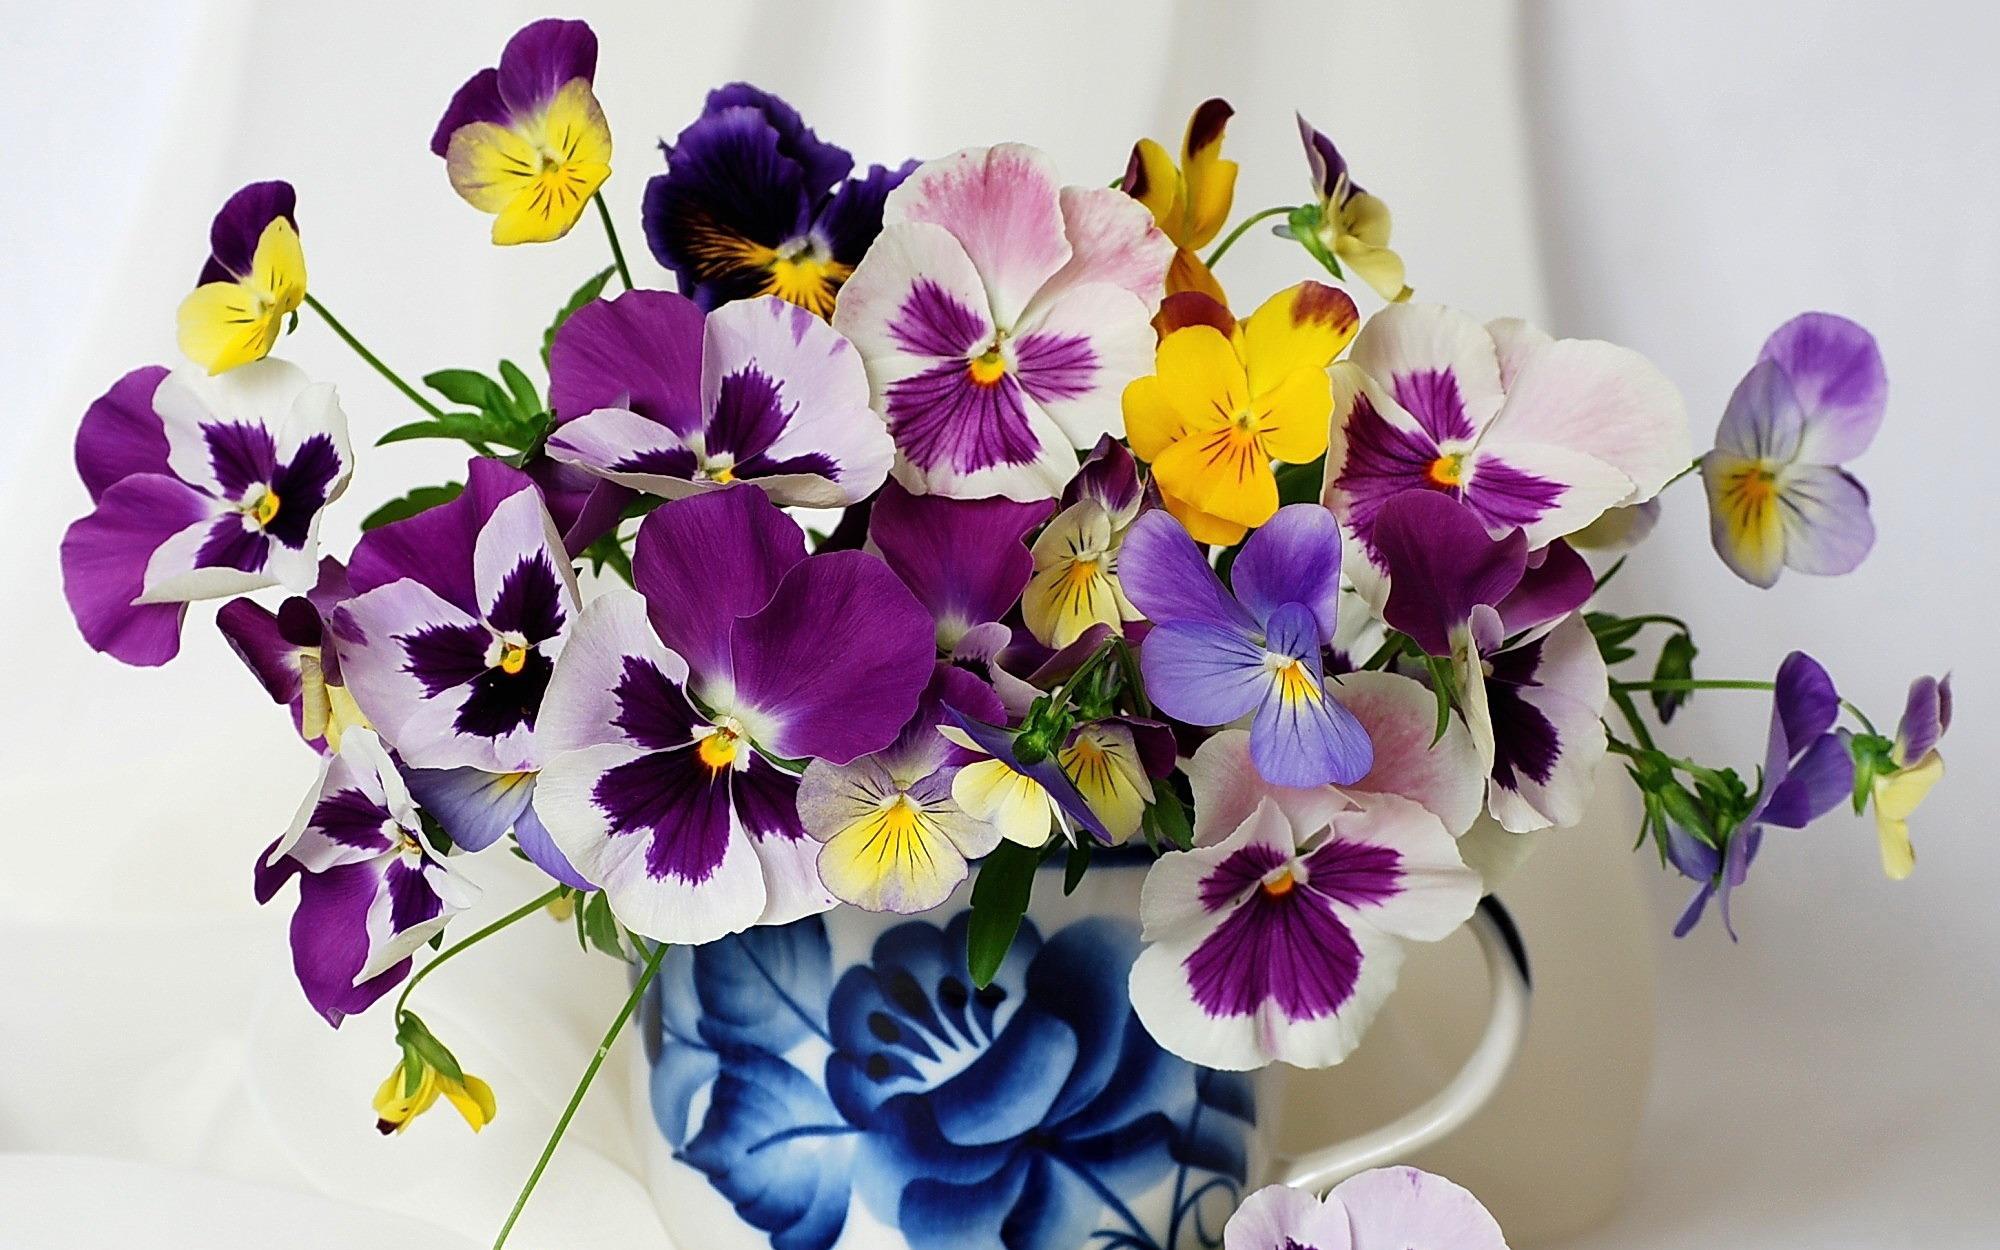 http://www.zastavki.com/pictures/originals/2014/Nature___Flowers_Bouquet_of_flowers_viola_(violet__pansy)_066241_.jpg